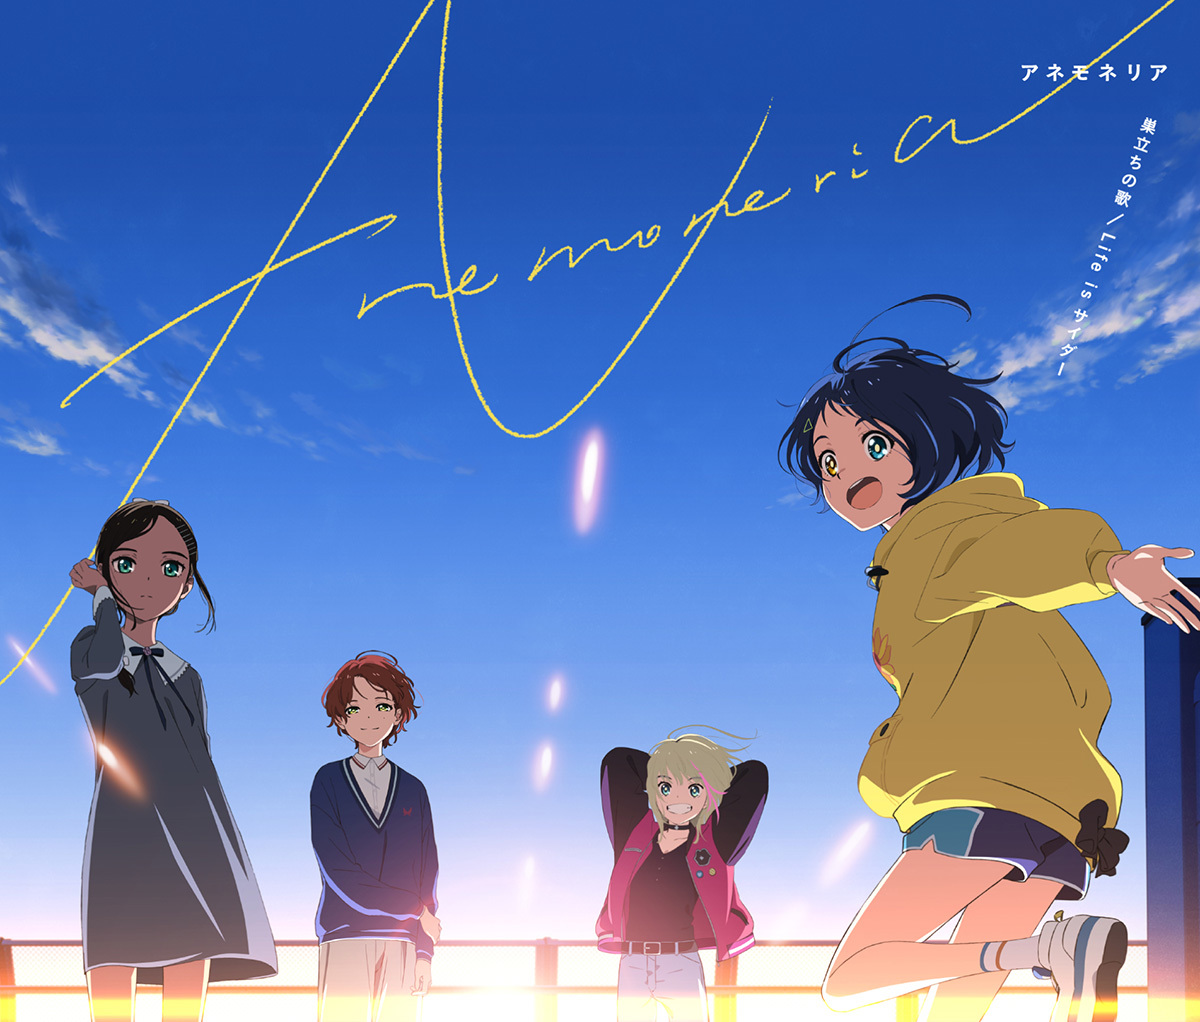 1st EP「巣立ちの歌 / Life is サイダー」アネモネリア盤(初回生産限定盤) (c)WEP PROJECT